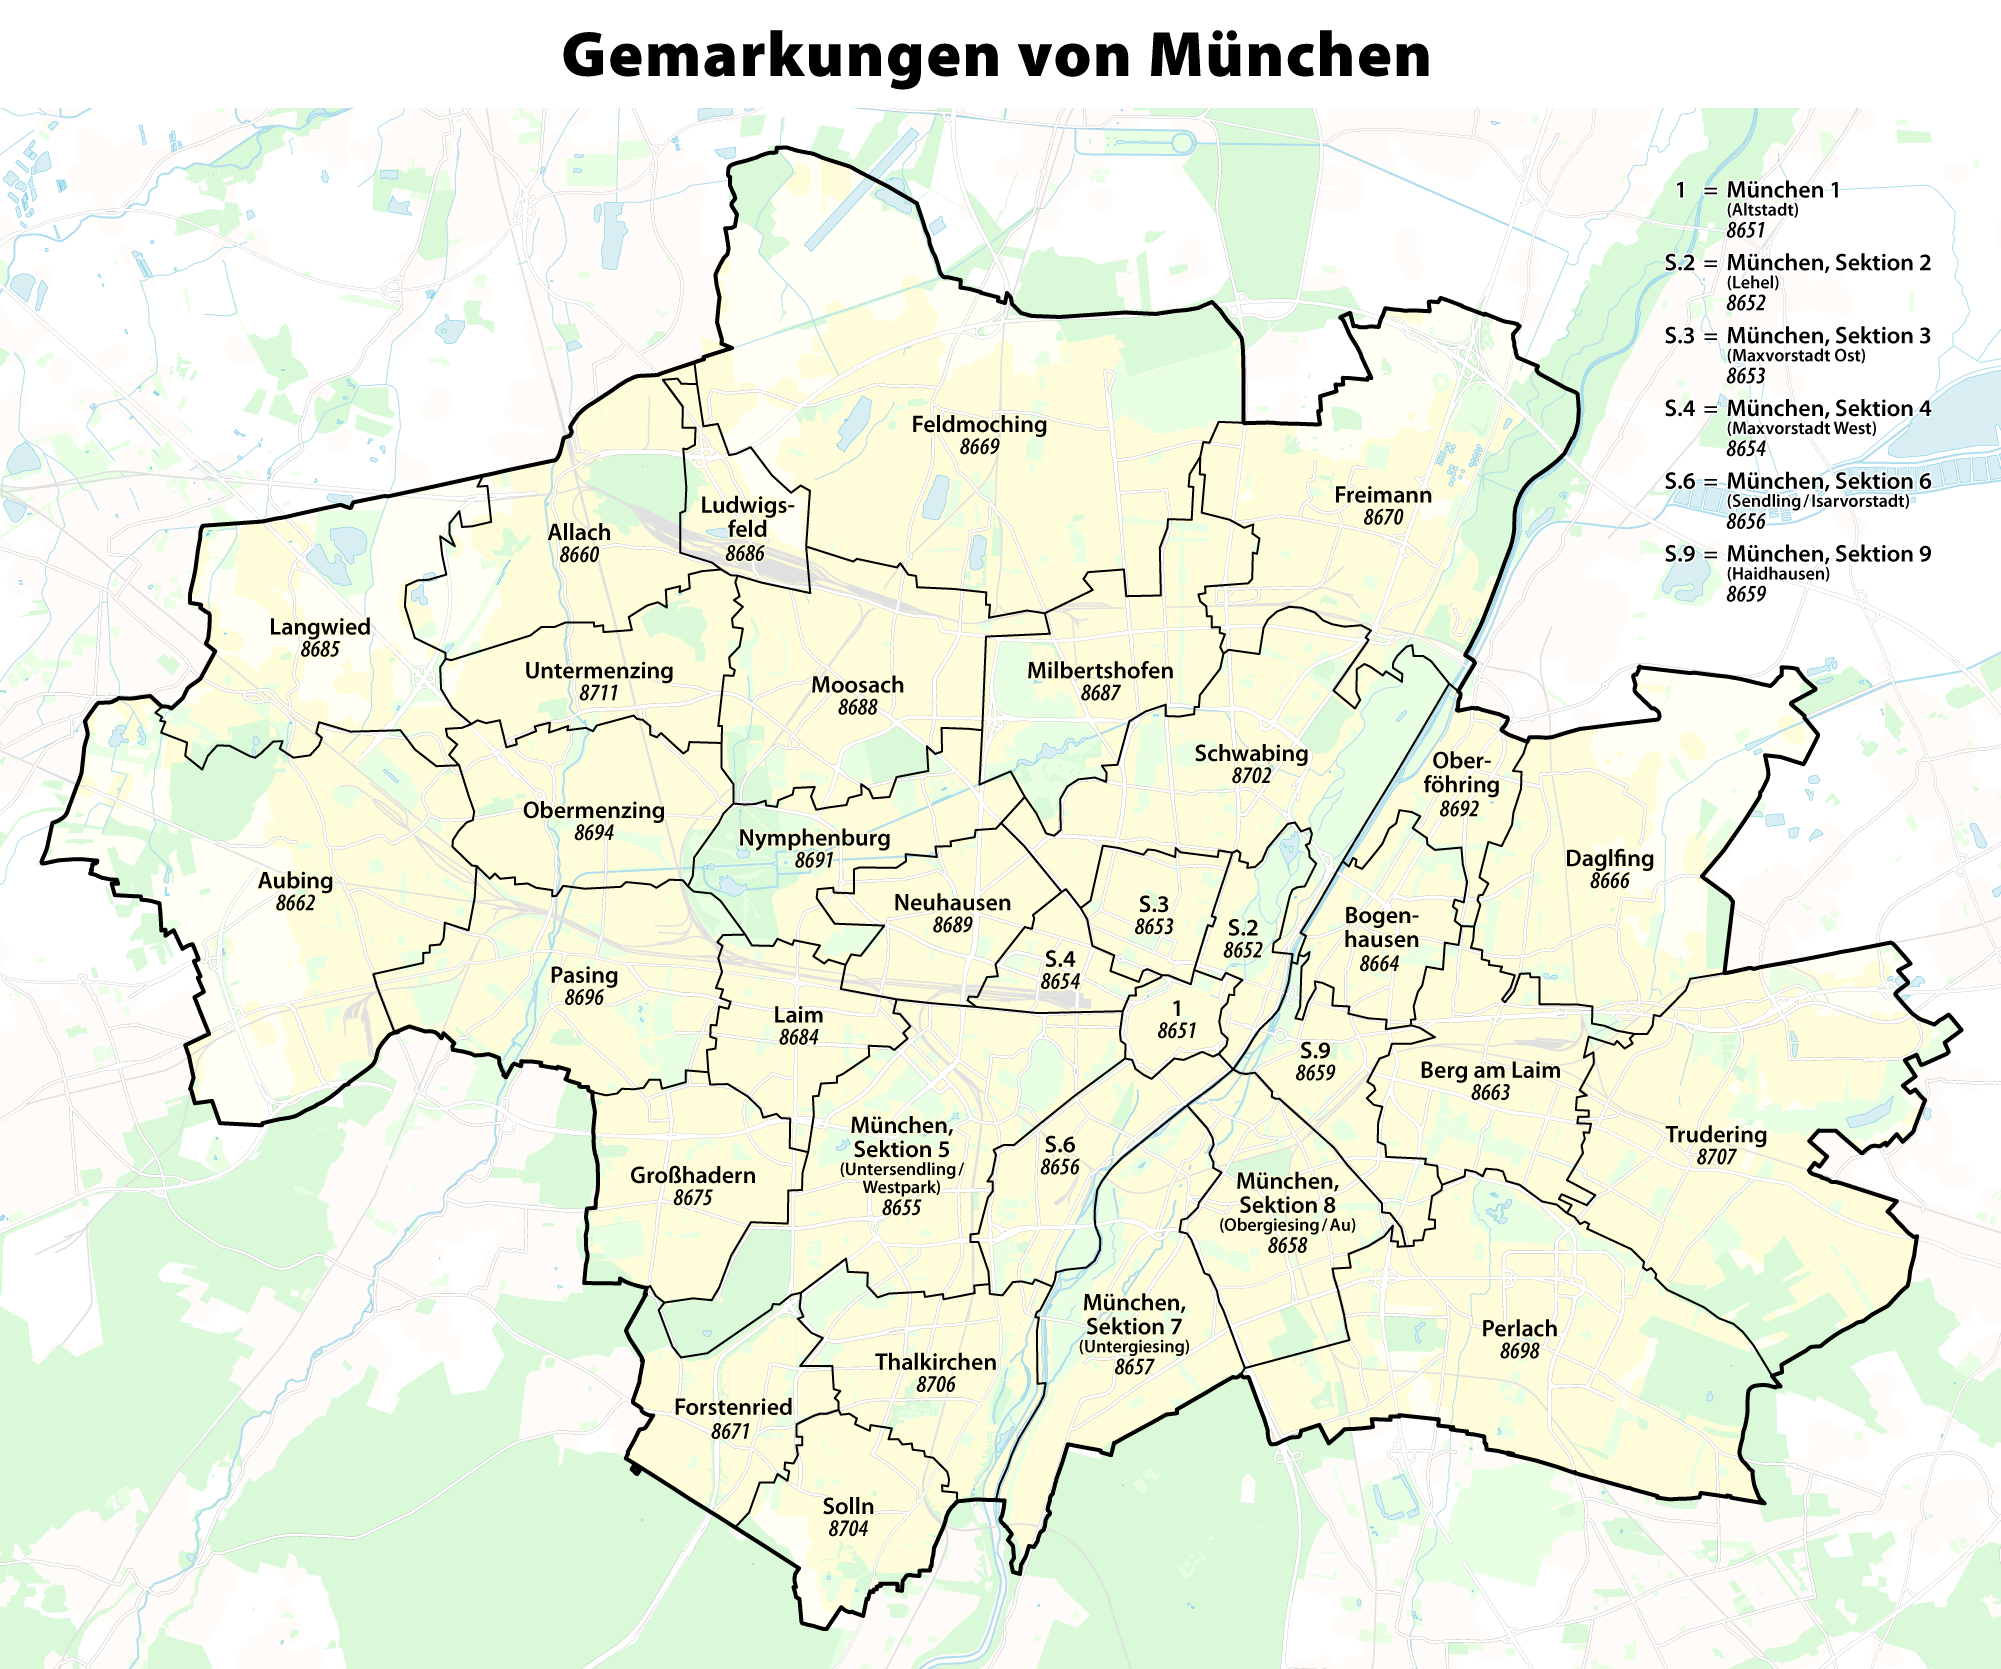 Telekom Hotel Munchen